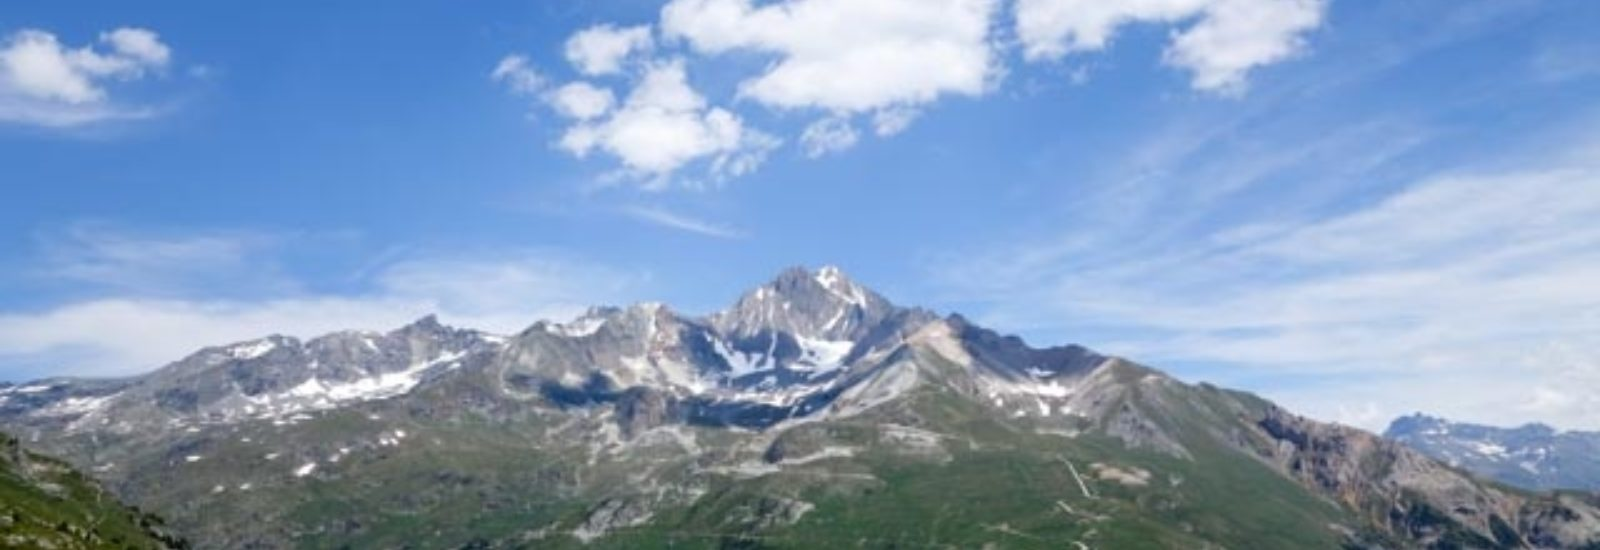 Incredible views across the Alps